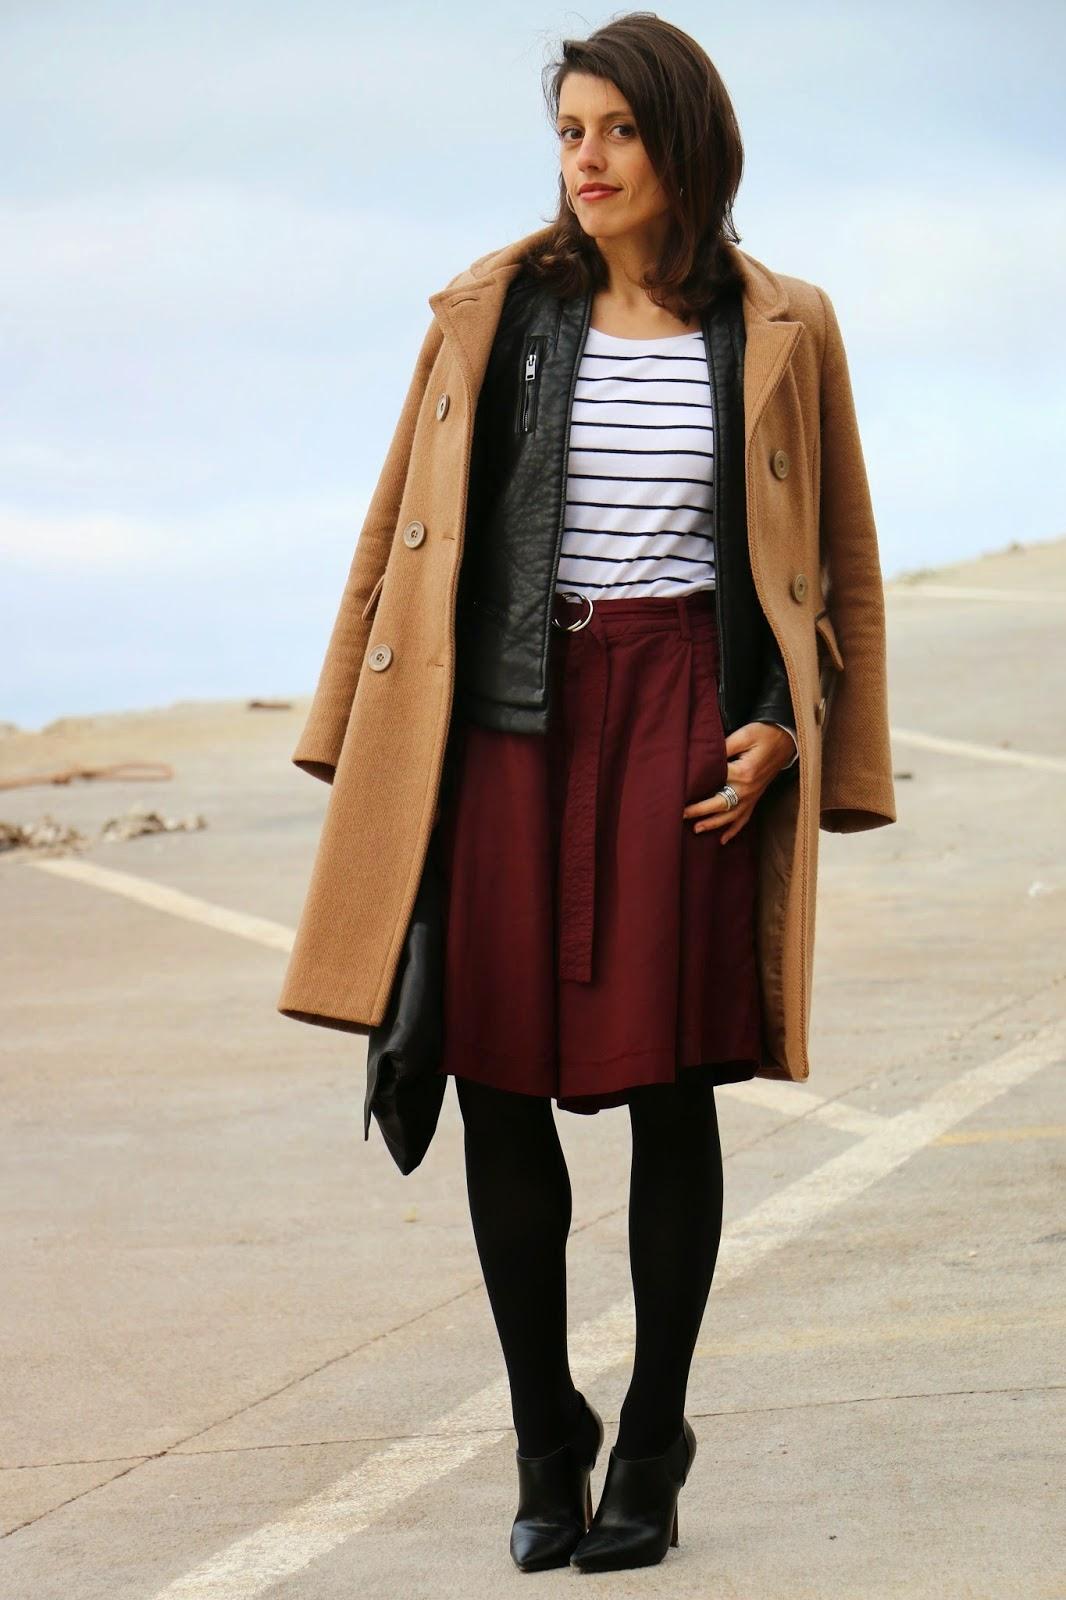 http://ilovefitametrica.blogspot.pt/2014/12/burgundy-culottes.html